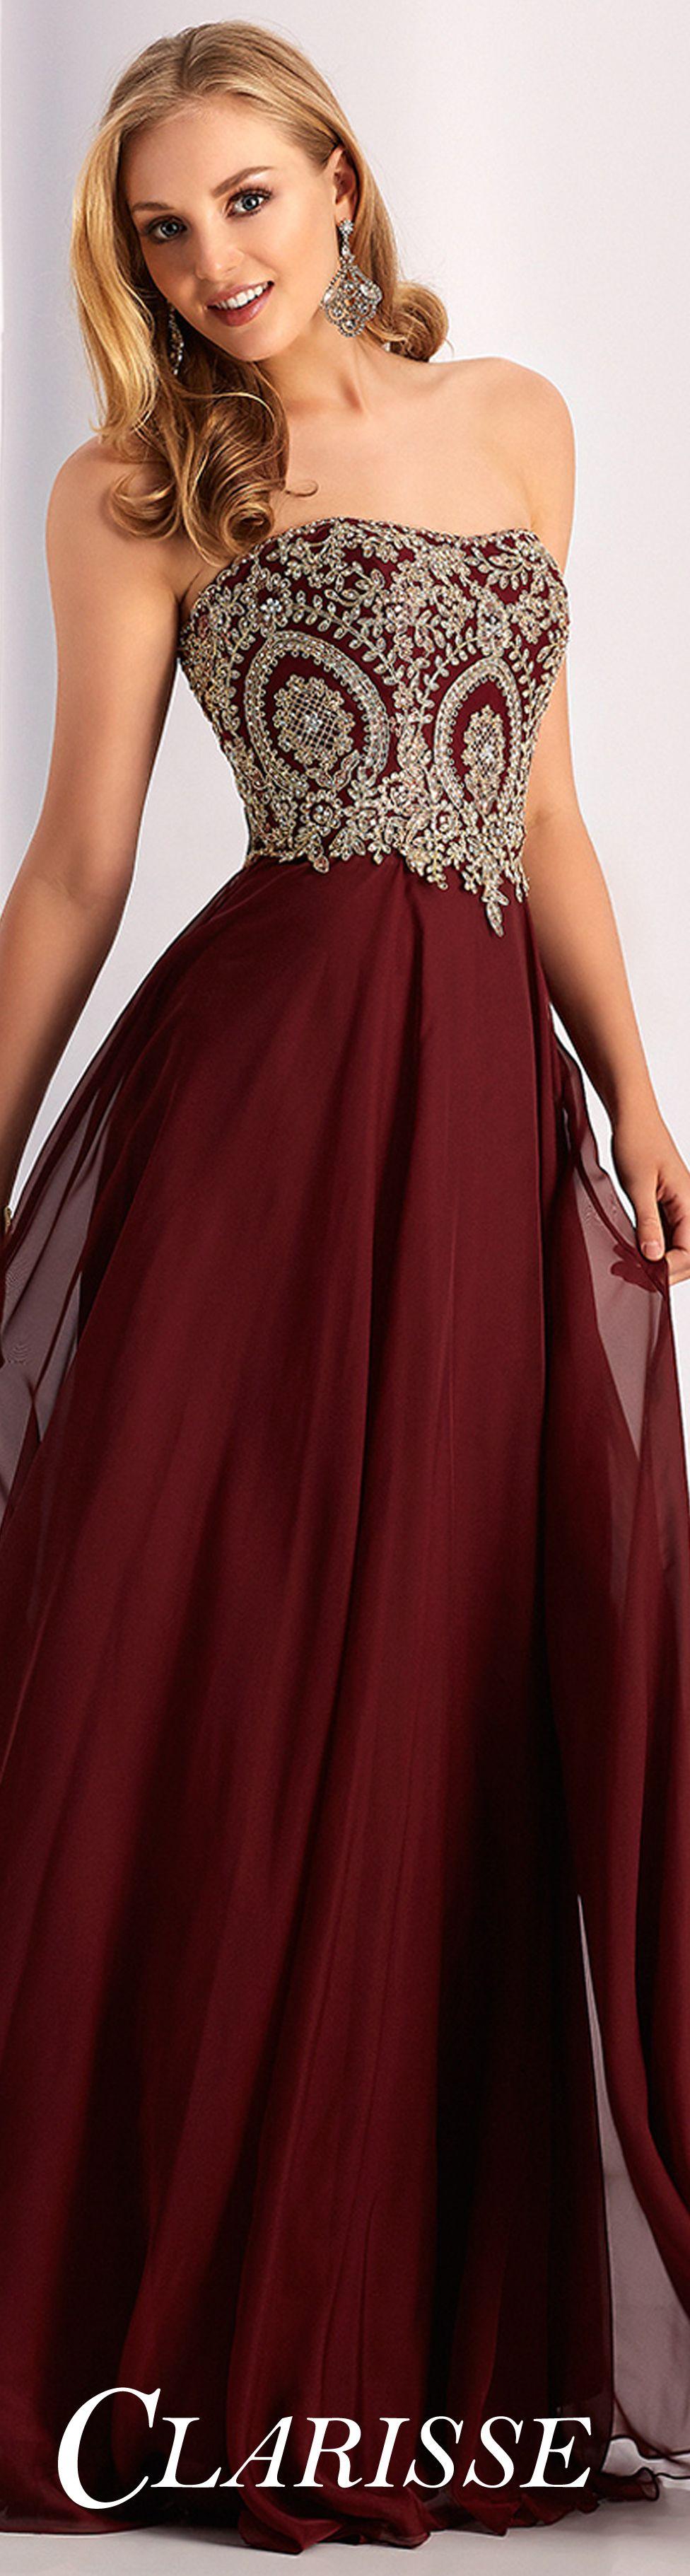 Red prom dresses 3000